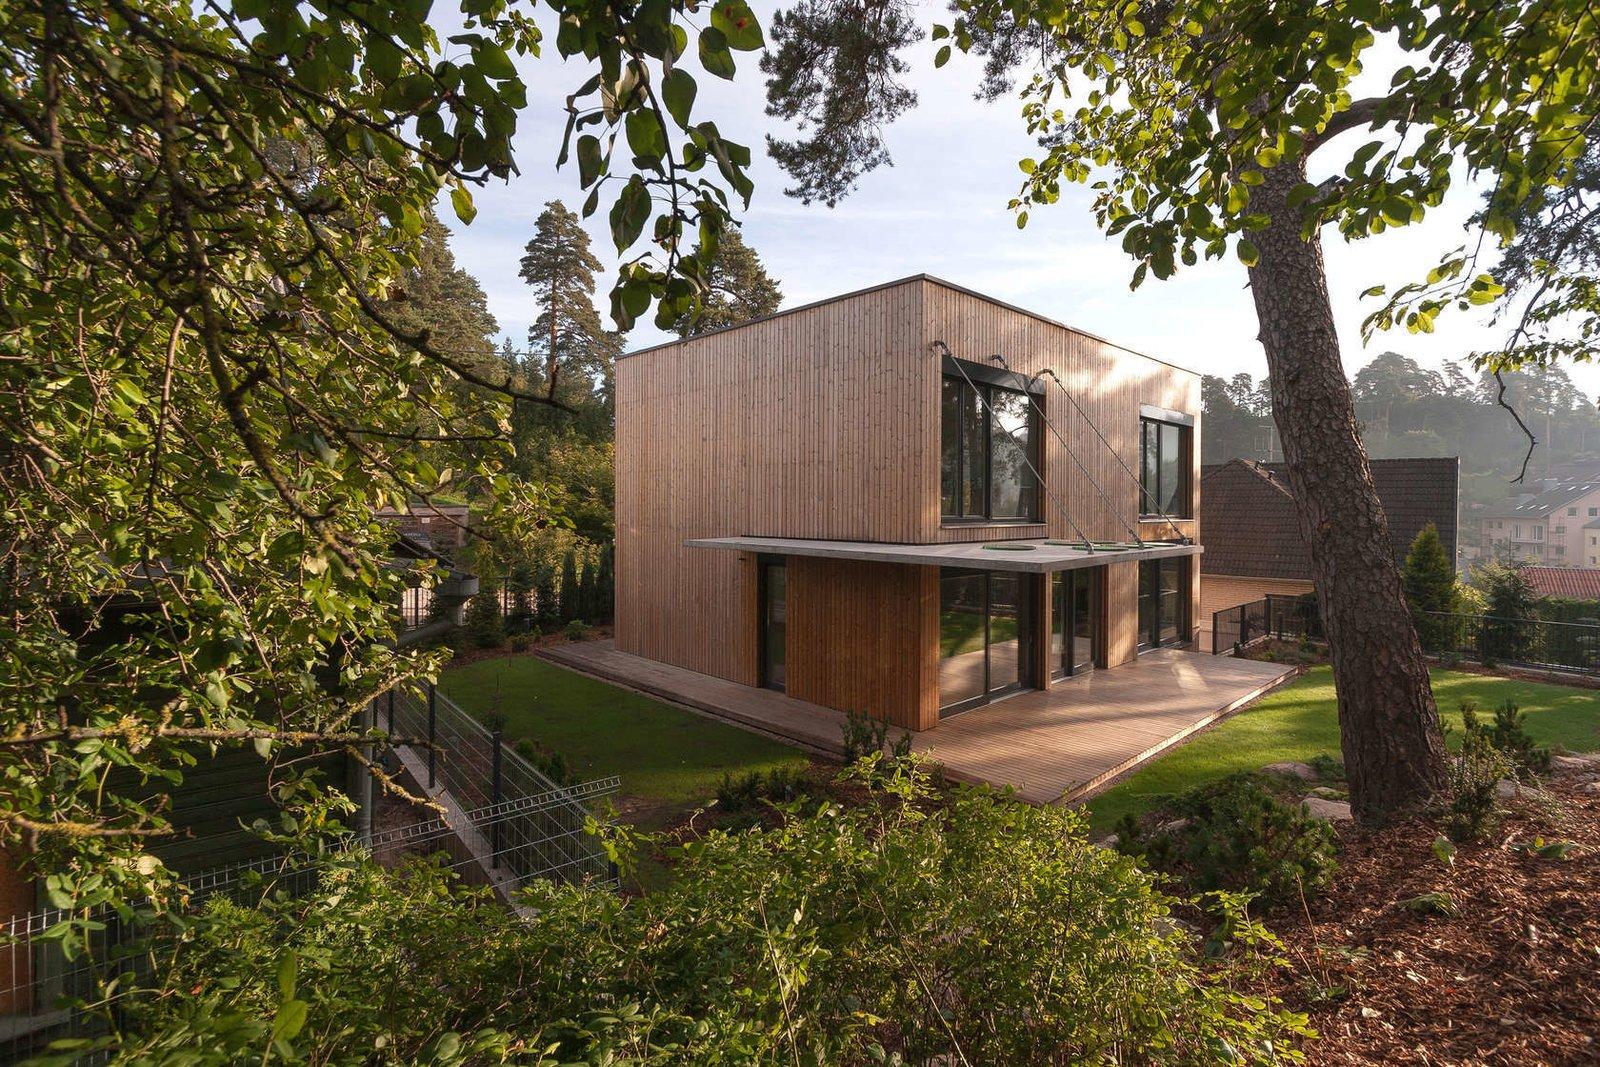 Via Architizer, photo by Aketuri Architektai  Photo 9 of 11 in This Week's 10 Best Houses